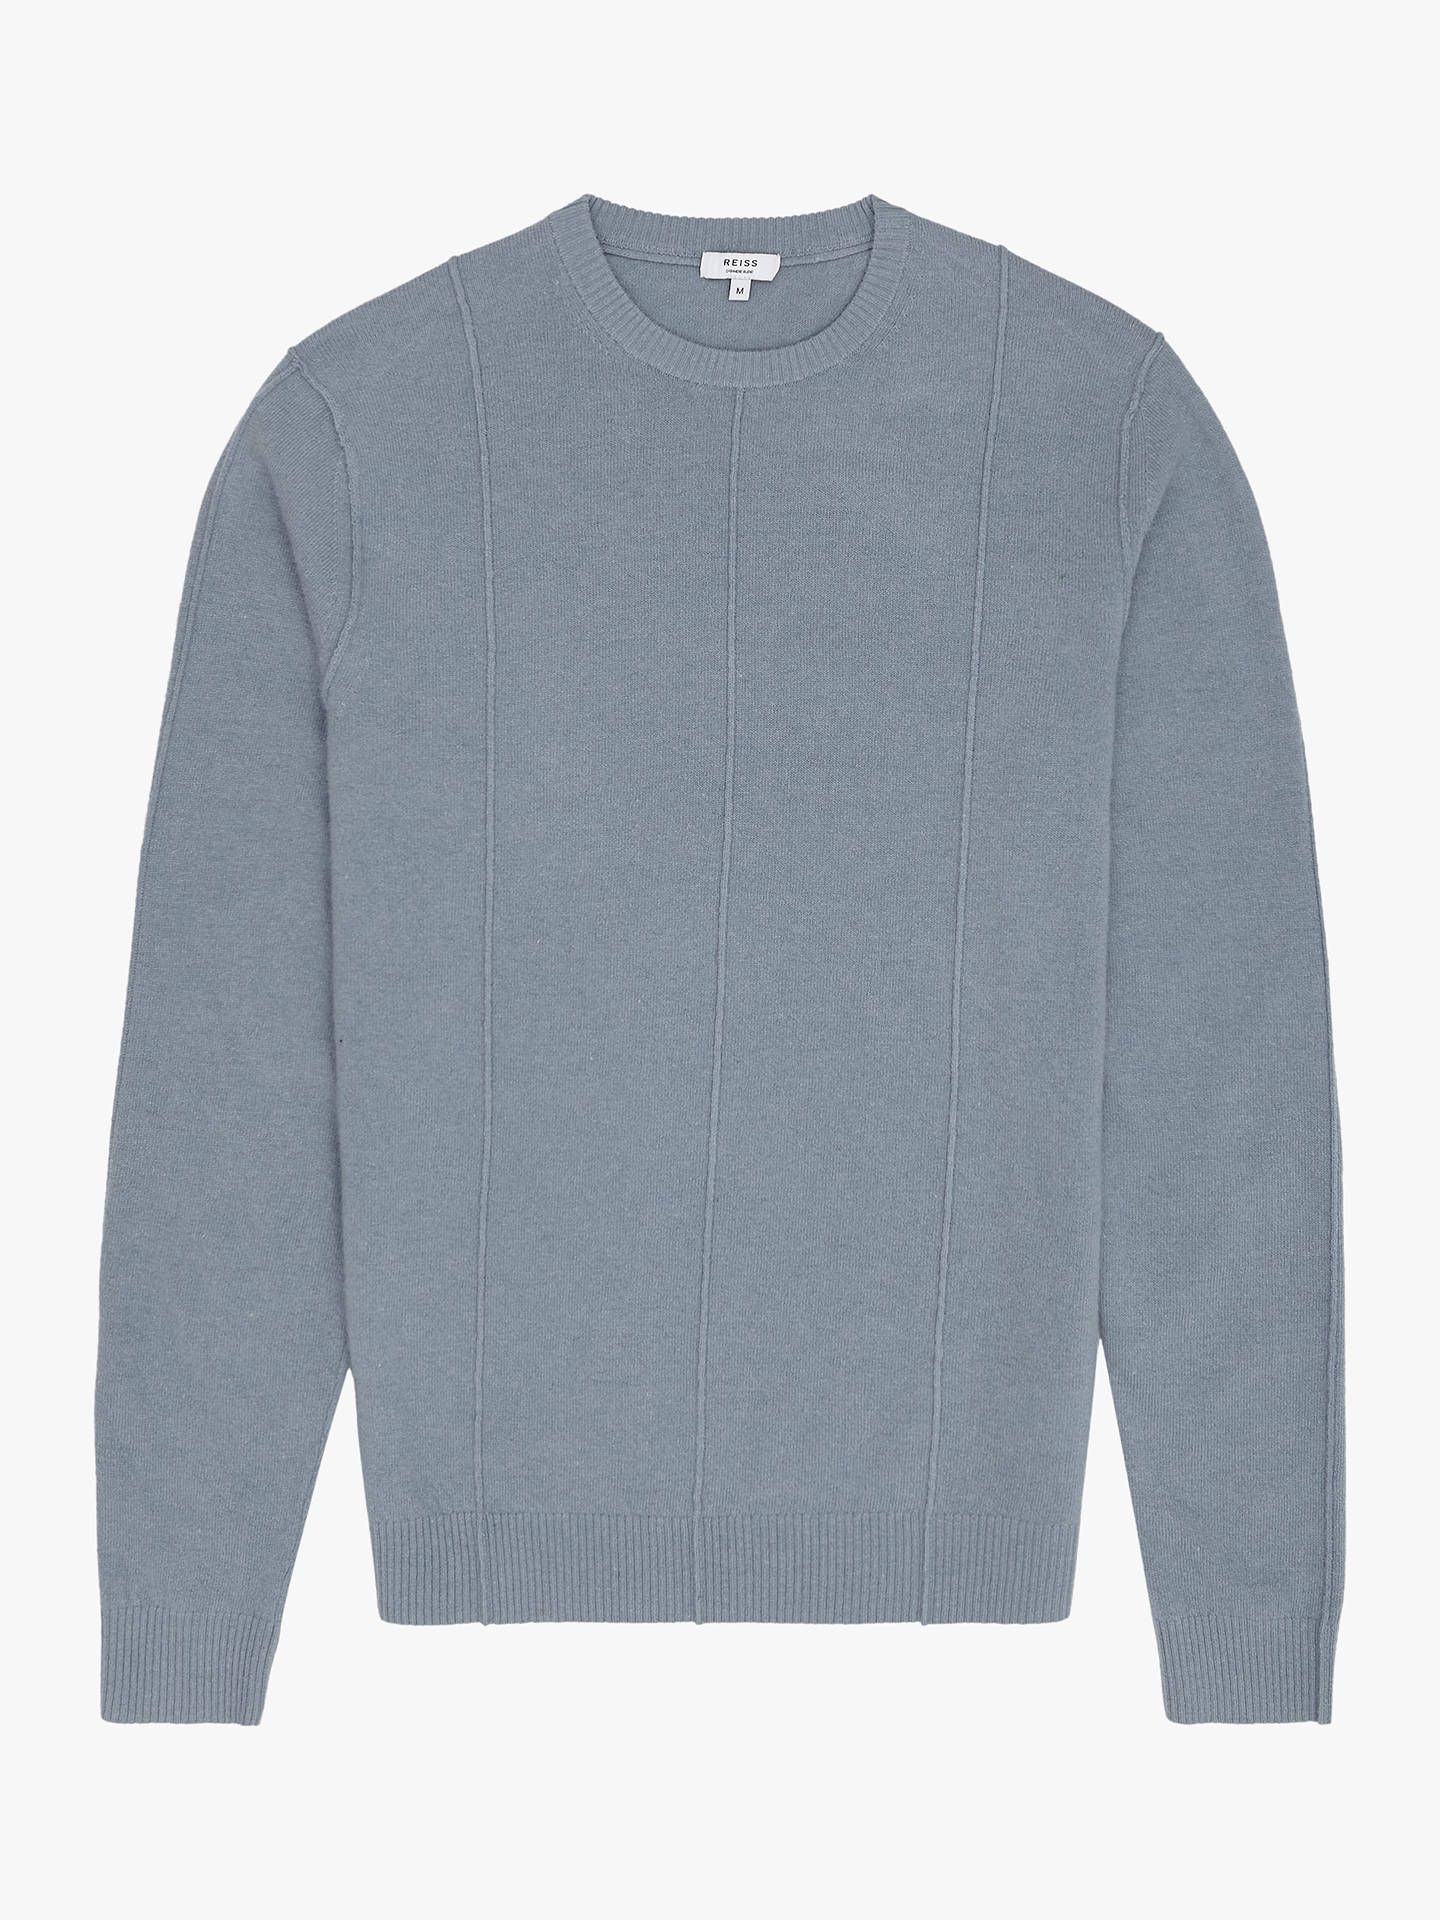 d2e95efcde8 ... Buy Reiss Champion Wool Cashmere Jumper, Airforce Blue, XL Online at  johnlewis.com